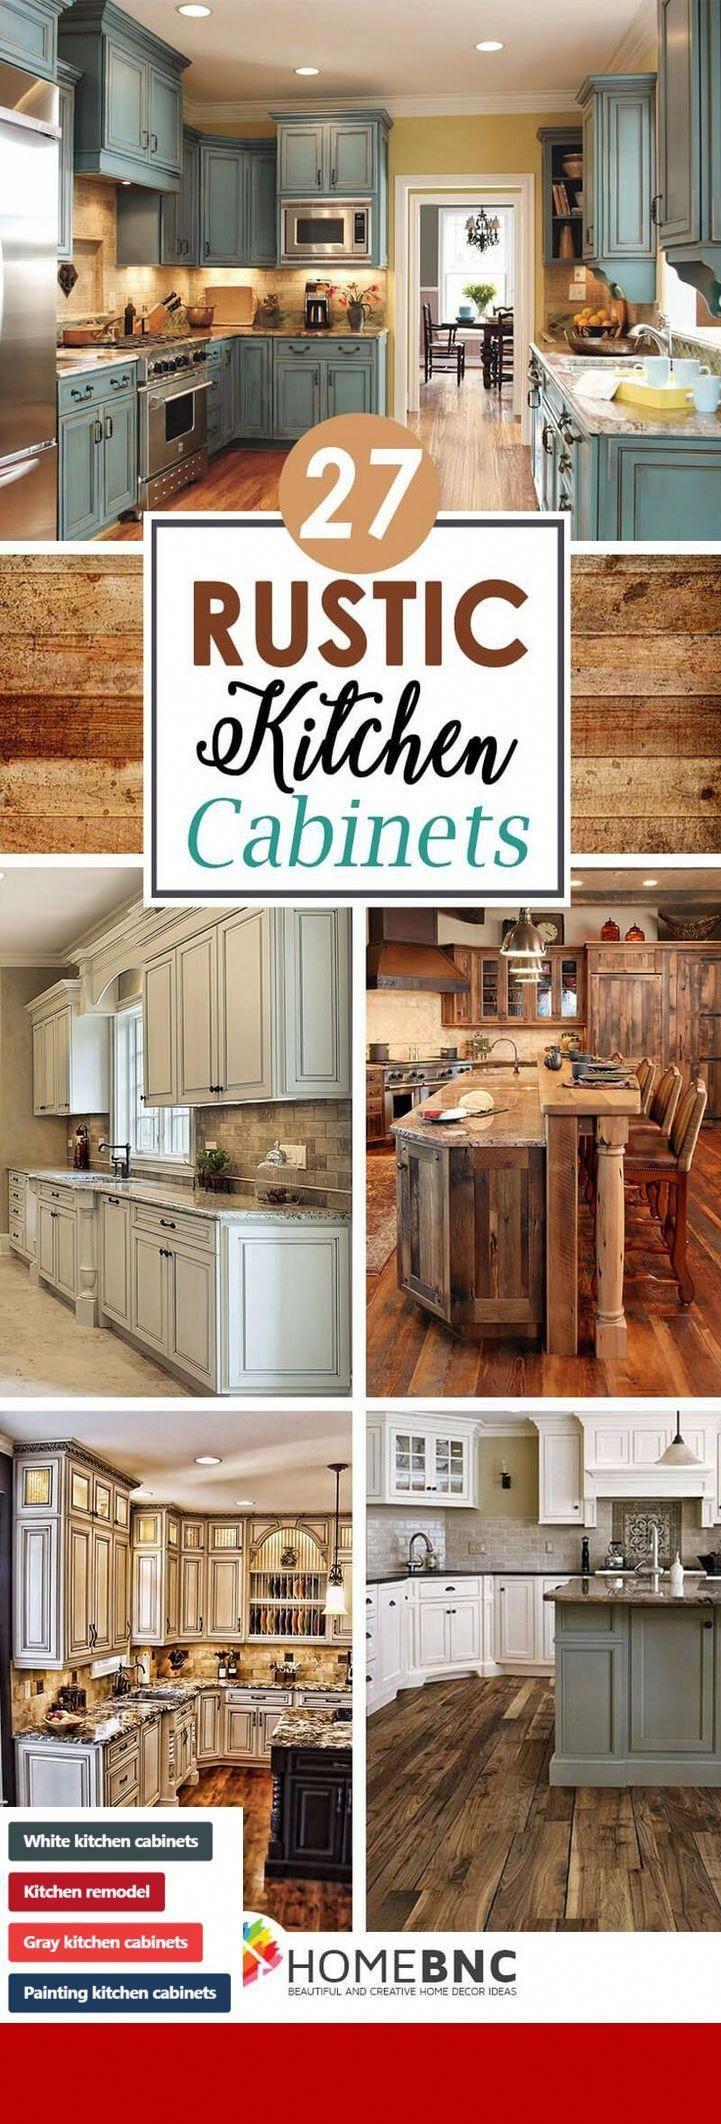 Installing Crown Molding Around Kitchen Cabinets #cabinets ...